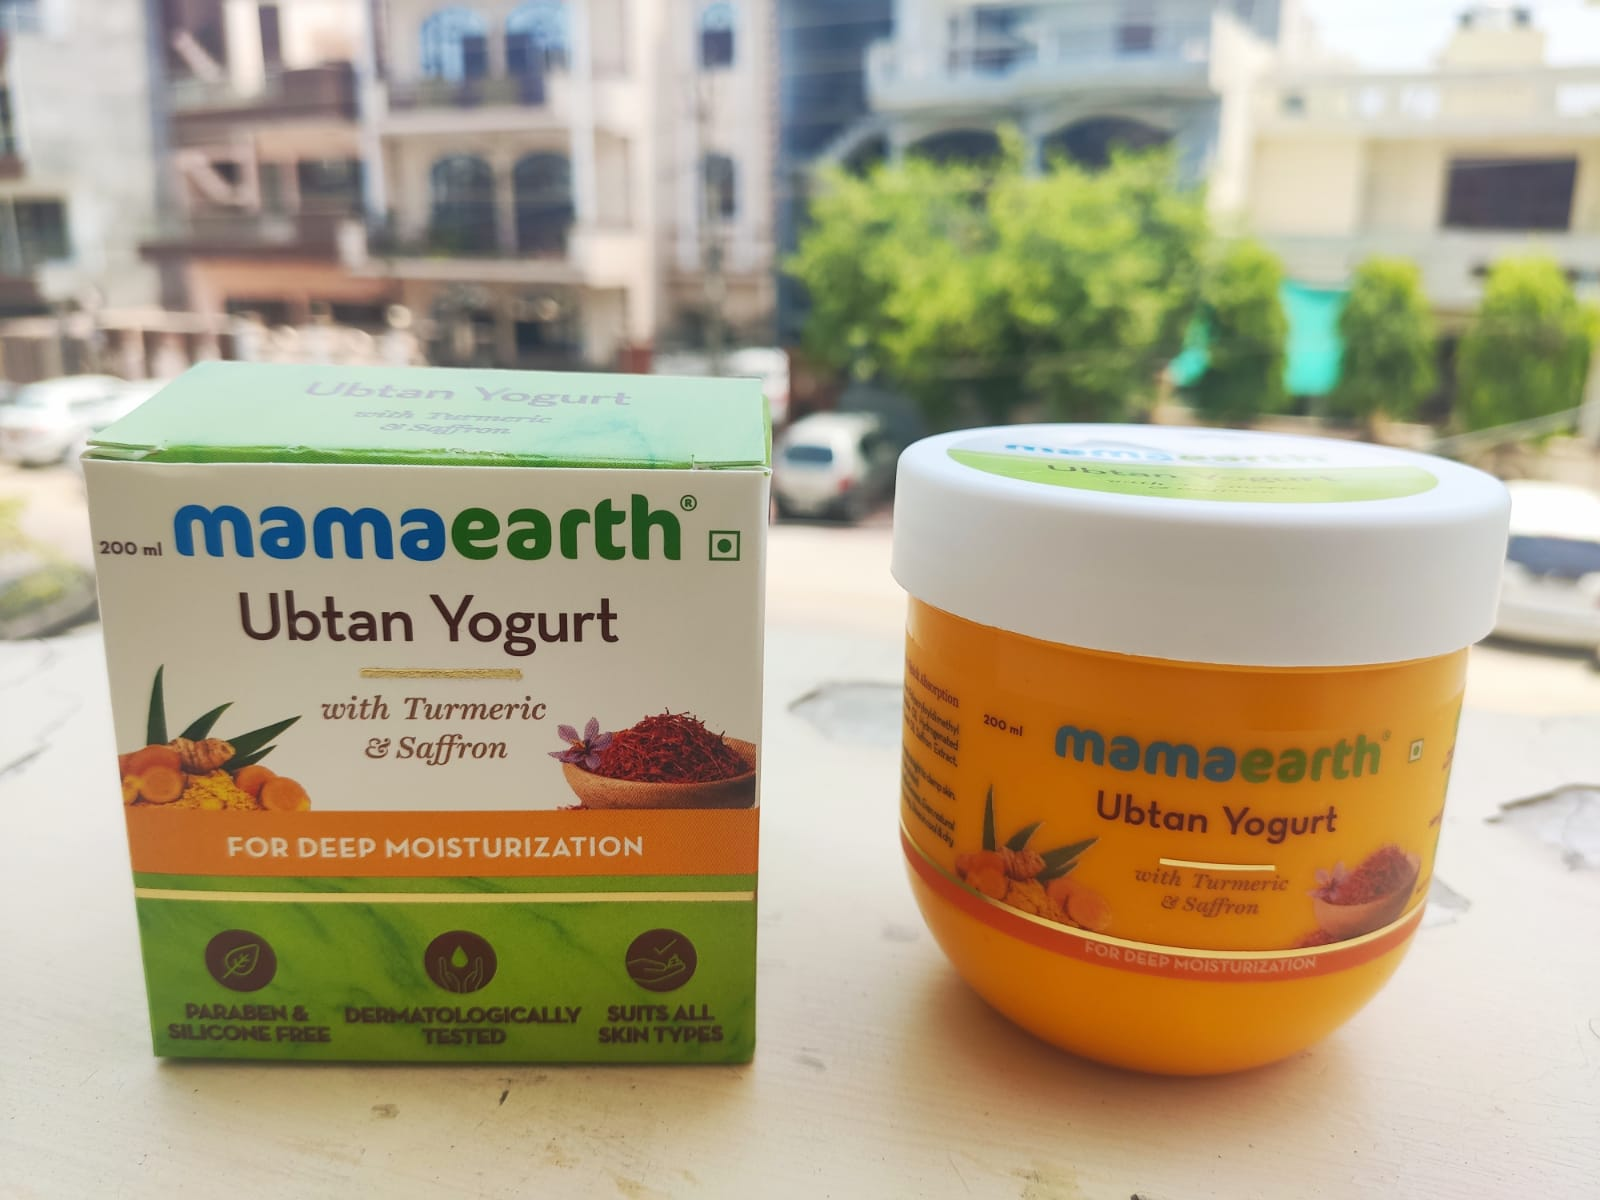 MamaEarth Ubtan Yogurt|Review